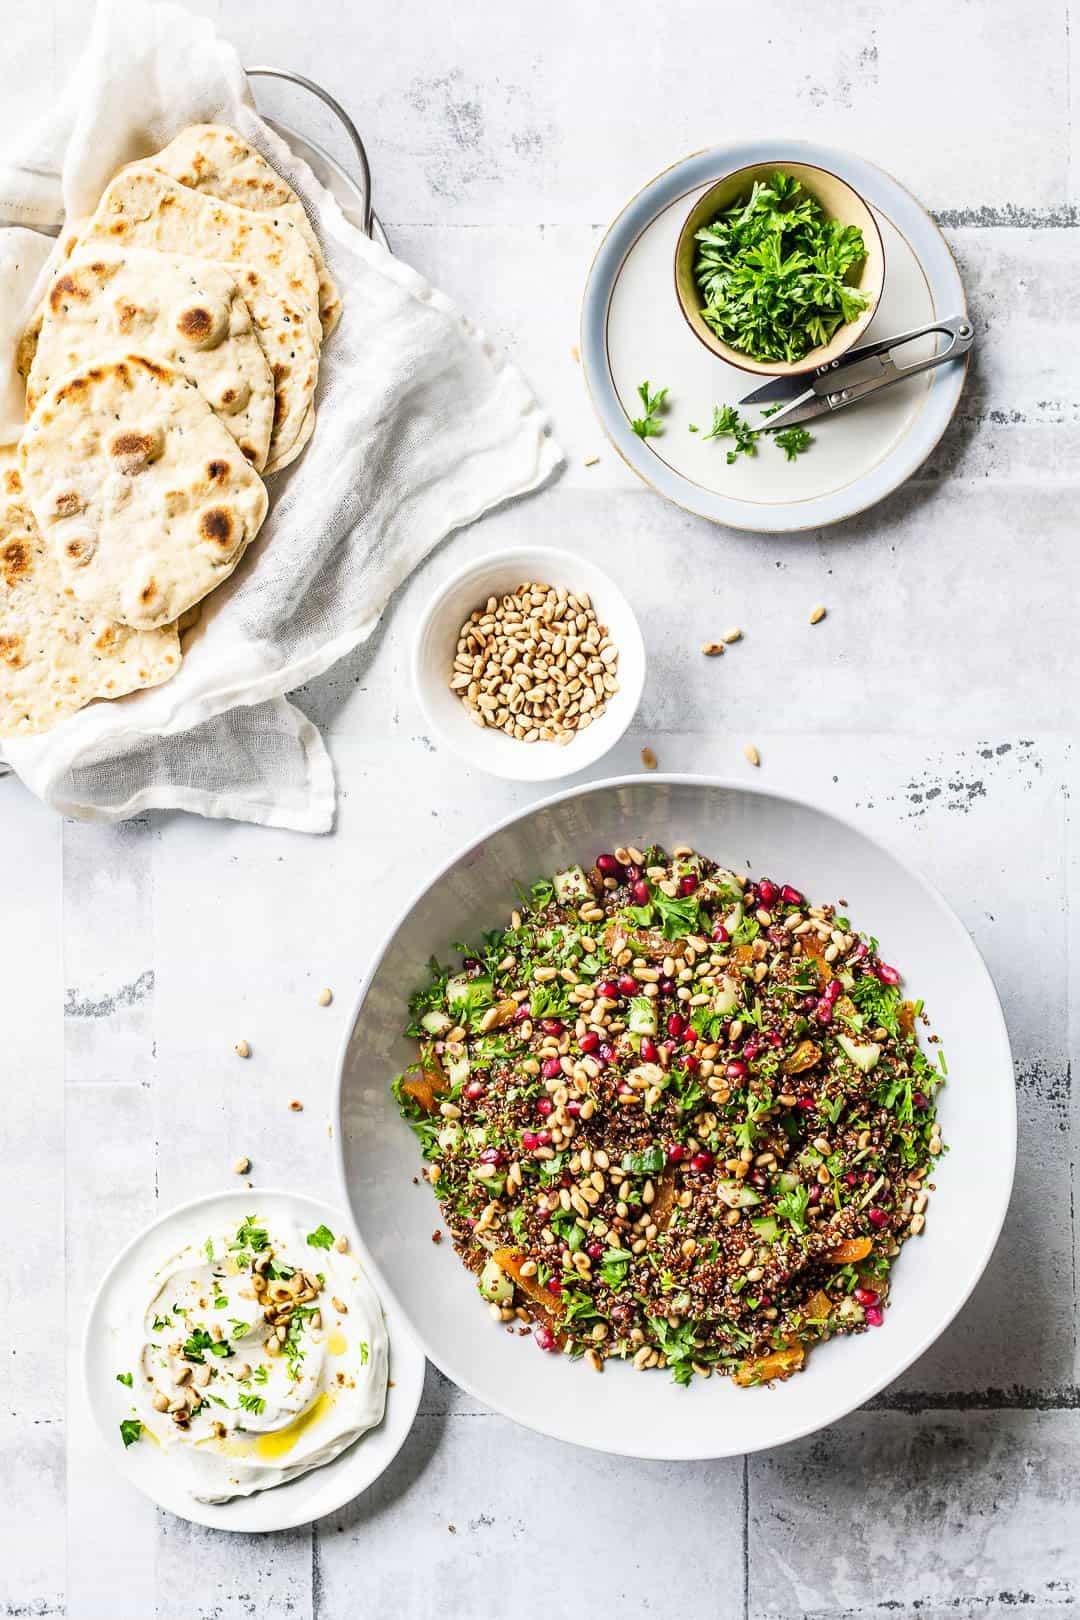 Quinoasalat med granatæble, abrikoser og citrusfrugter - opskrift quinoa